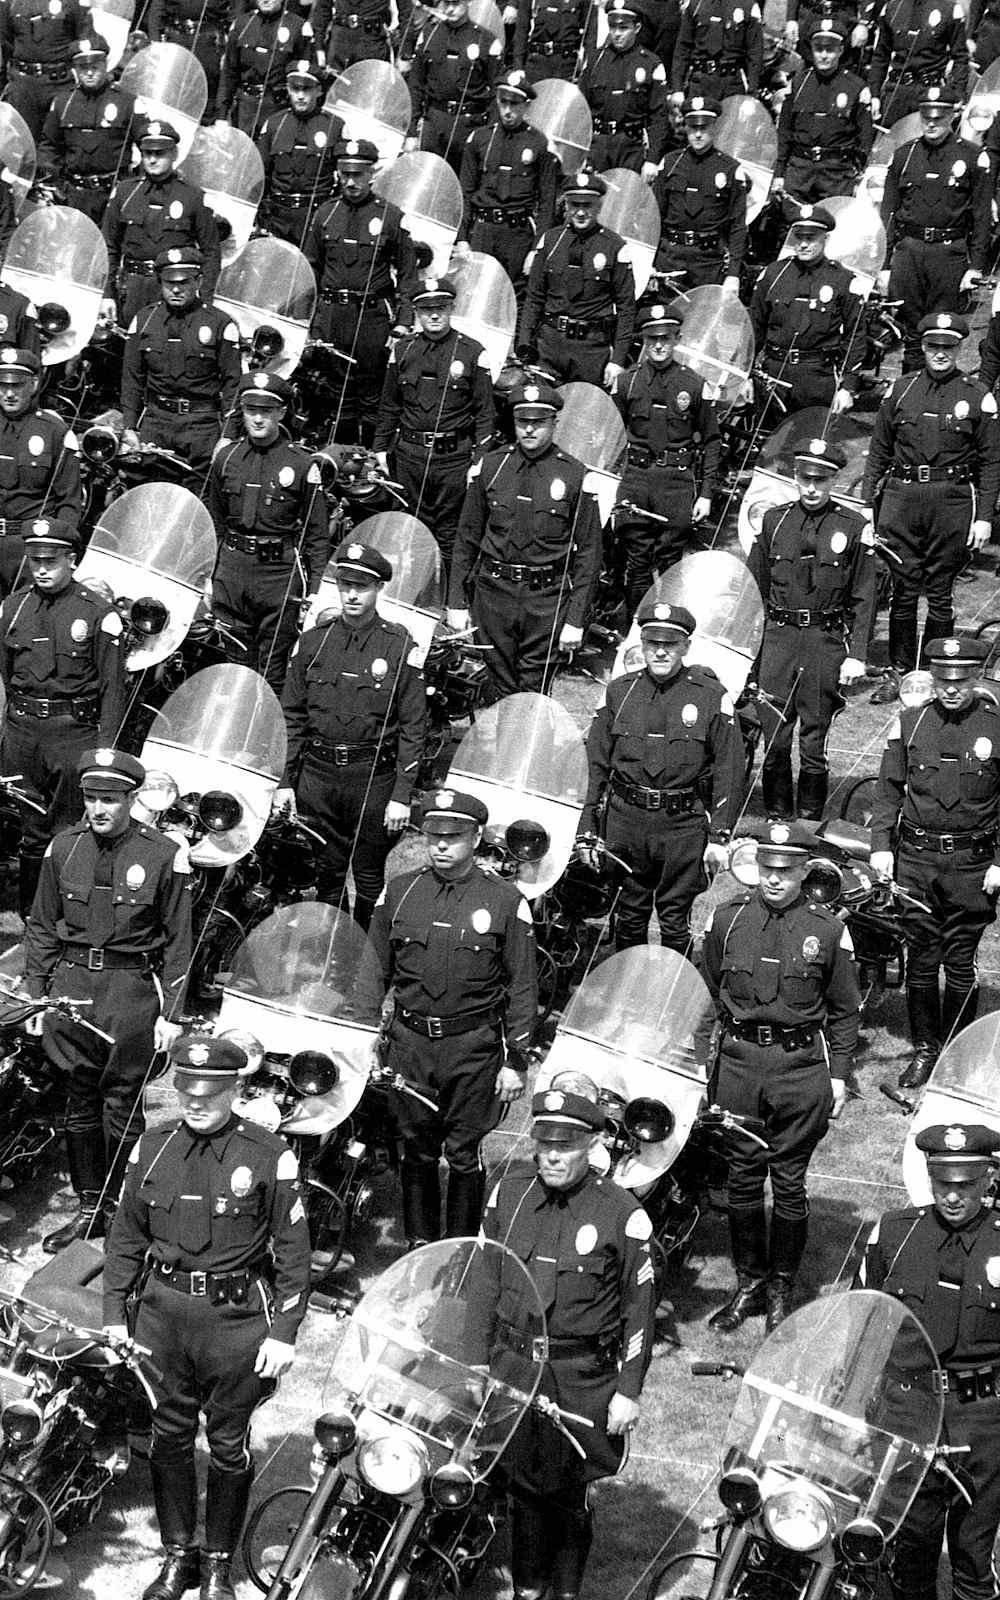 motorcycle police photograph USA